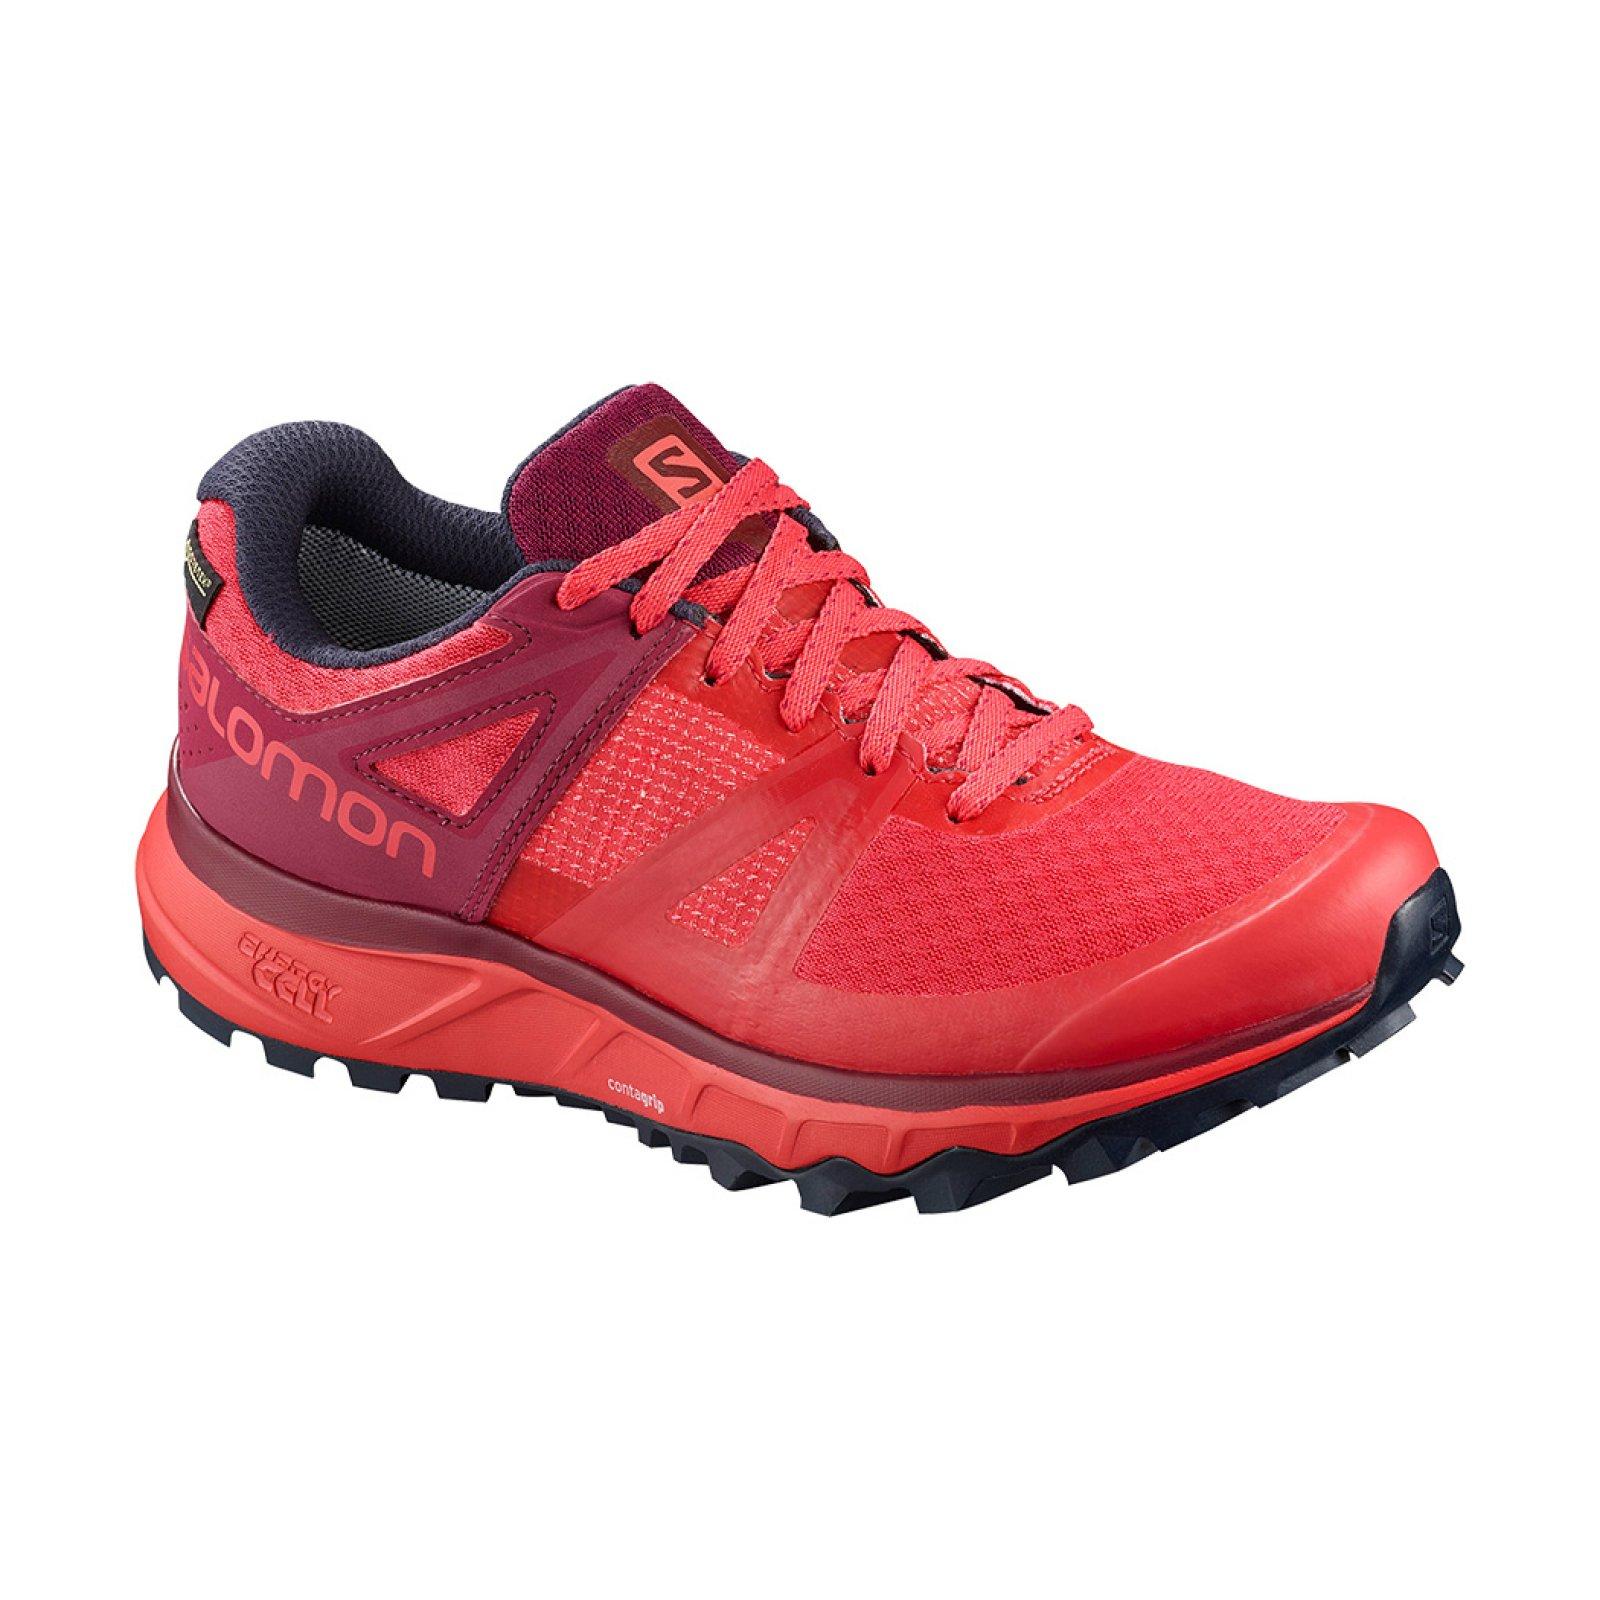 c04ca3819b3 Trailové běžecké boty Salomon Trailster GTX W L40488600 - Actisport.cz